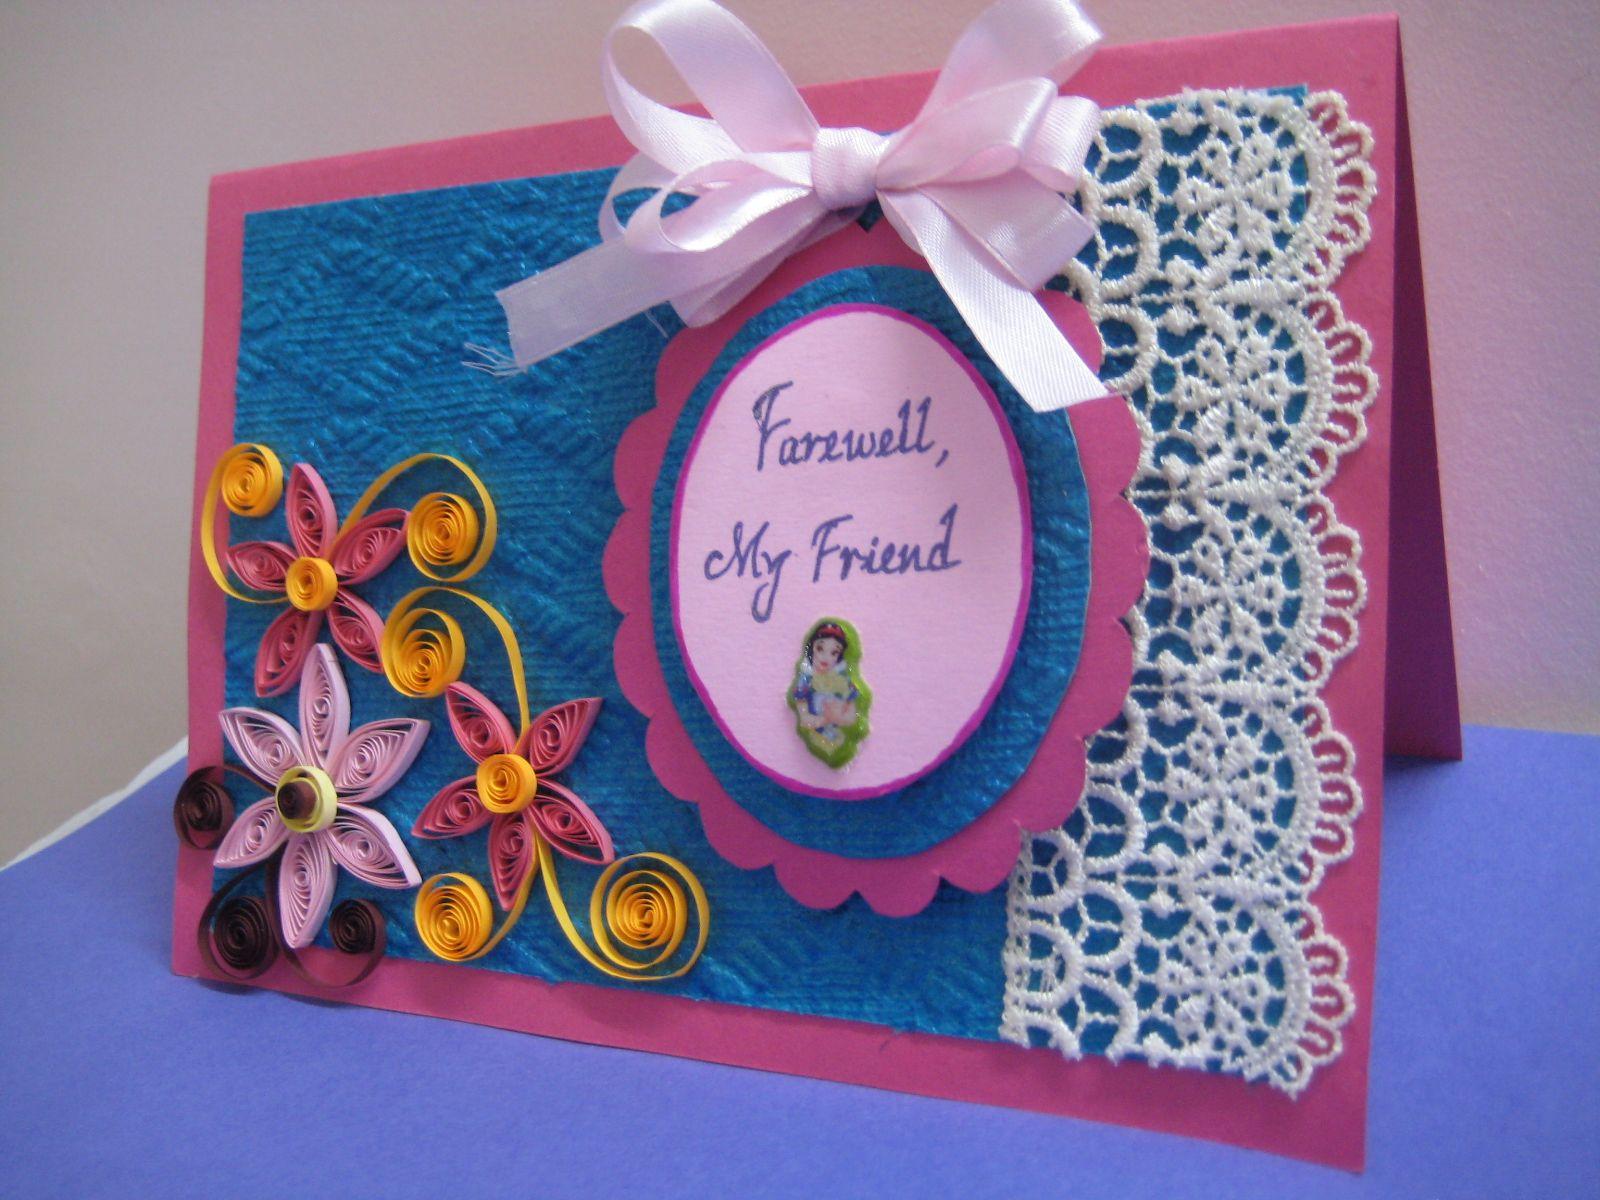 Handmade Farewell Cards Card design handmade, Farewell